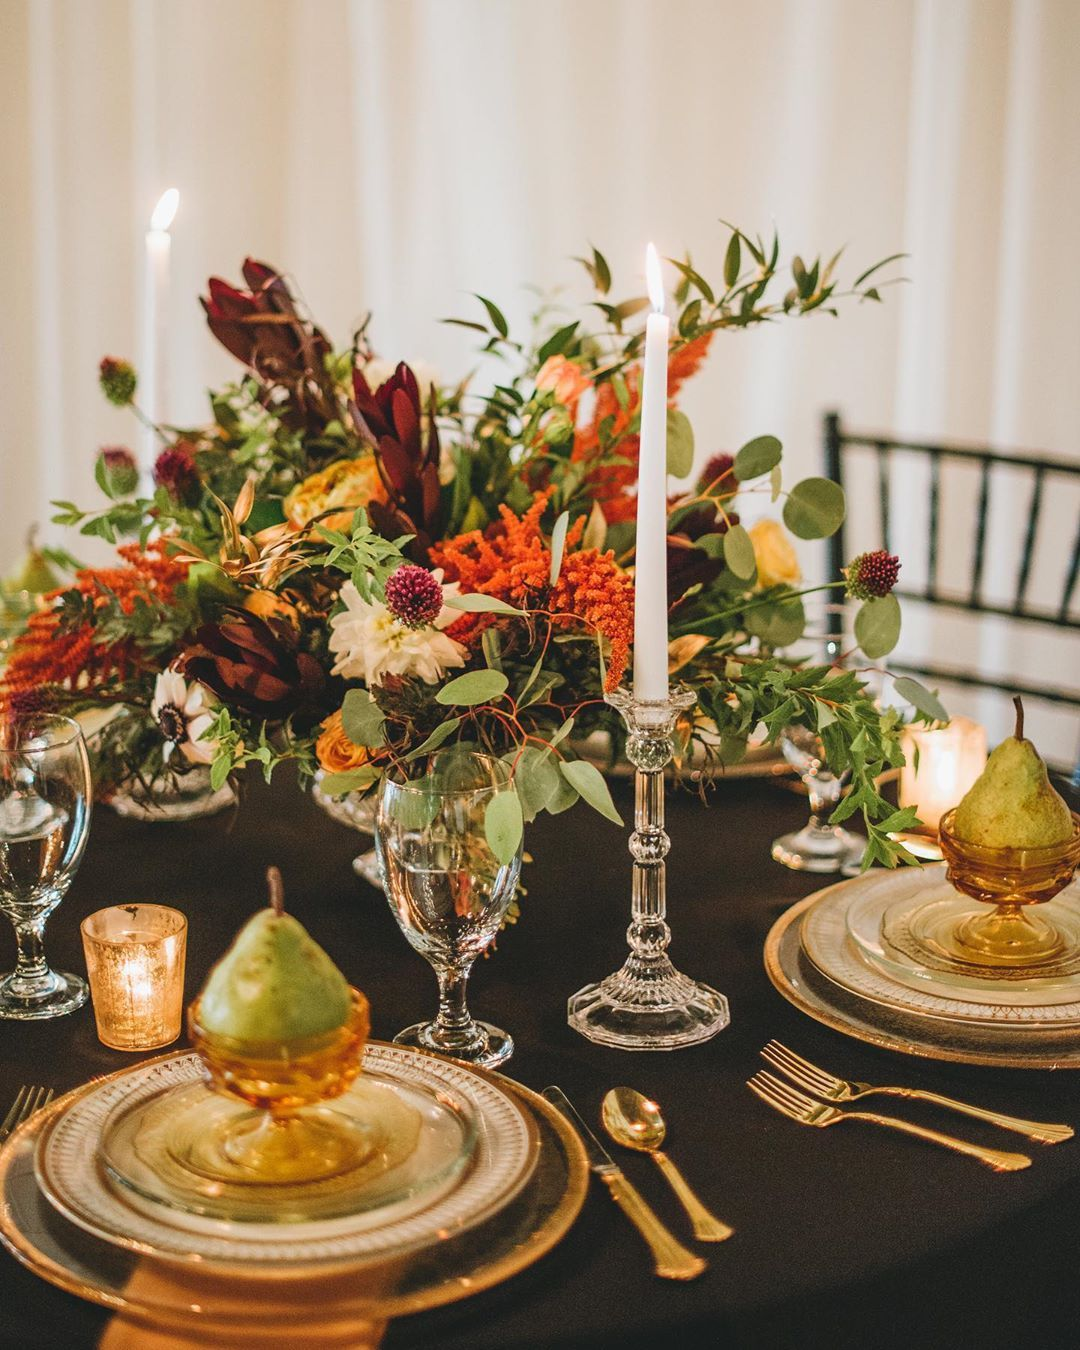 Rosh Hashanah holiday table